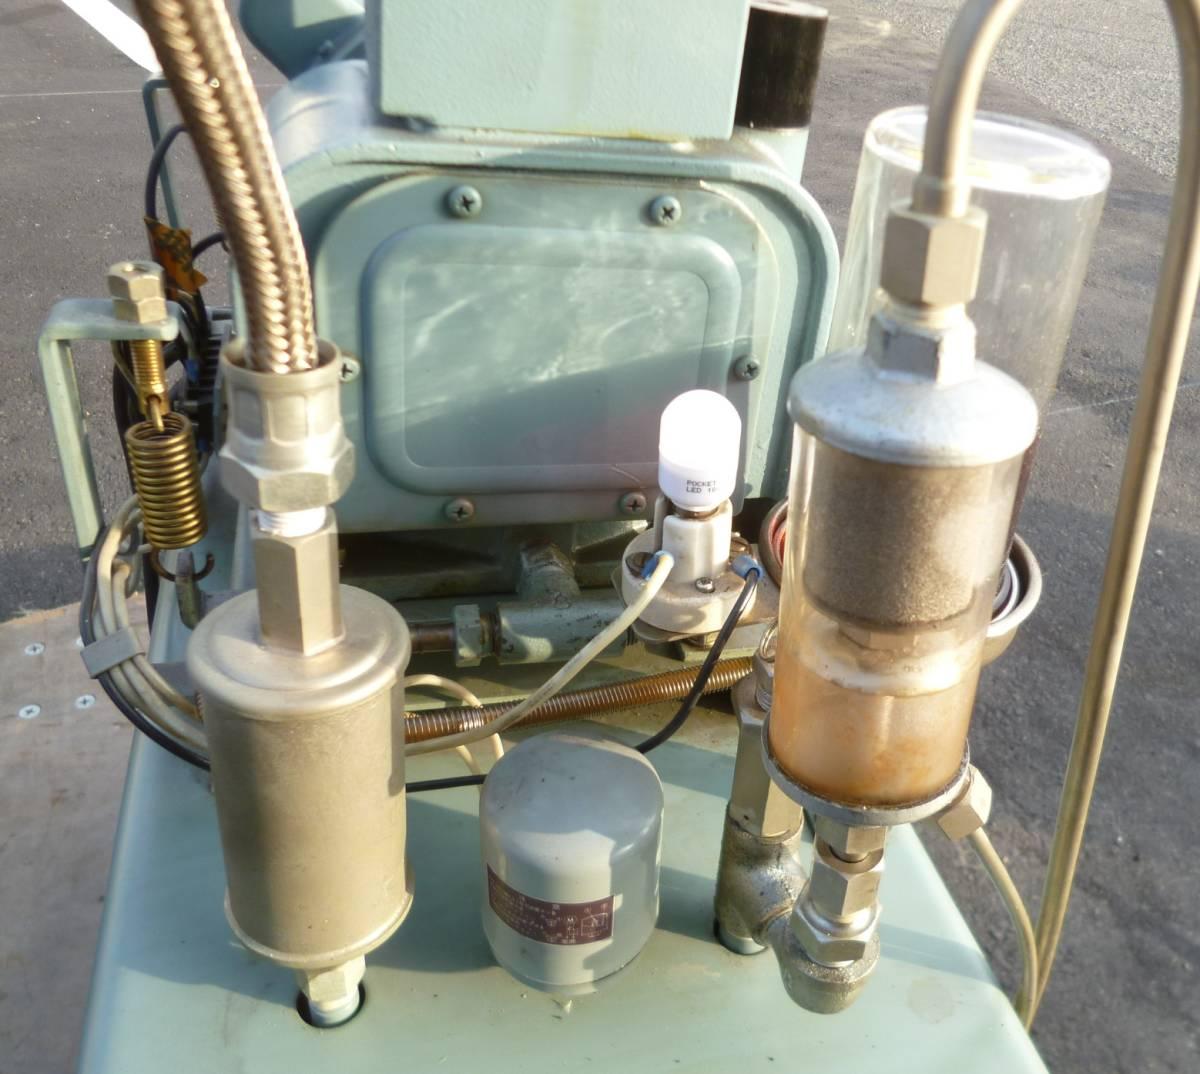 K7096c モリタ 日立 歯科用コンプレッサー A-9 ハイブロウ 100V 60Hz 4.8kg/cm^2_画像5